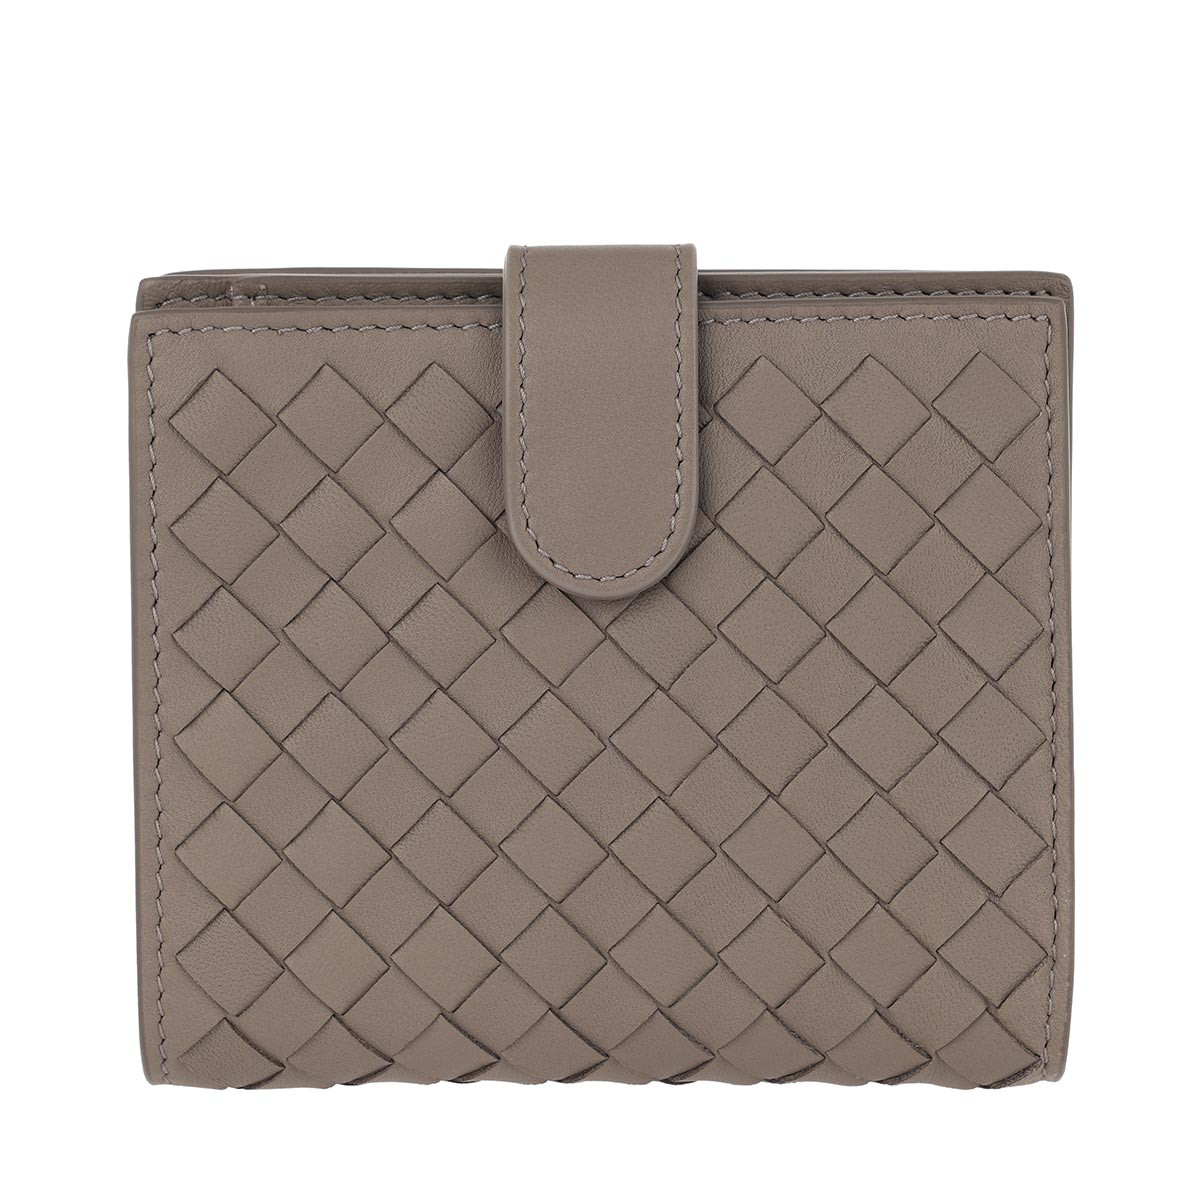 Bottega Veneta Portemonnaie - Intrecciato Mini Wallet Nappa Leather Limestone - in braun - für Damen